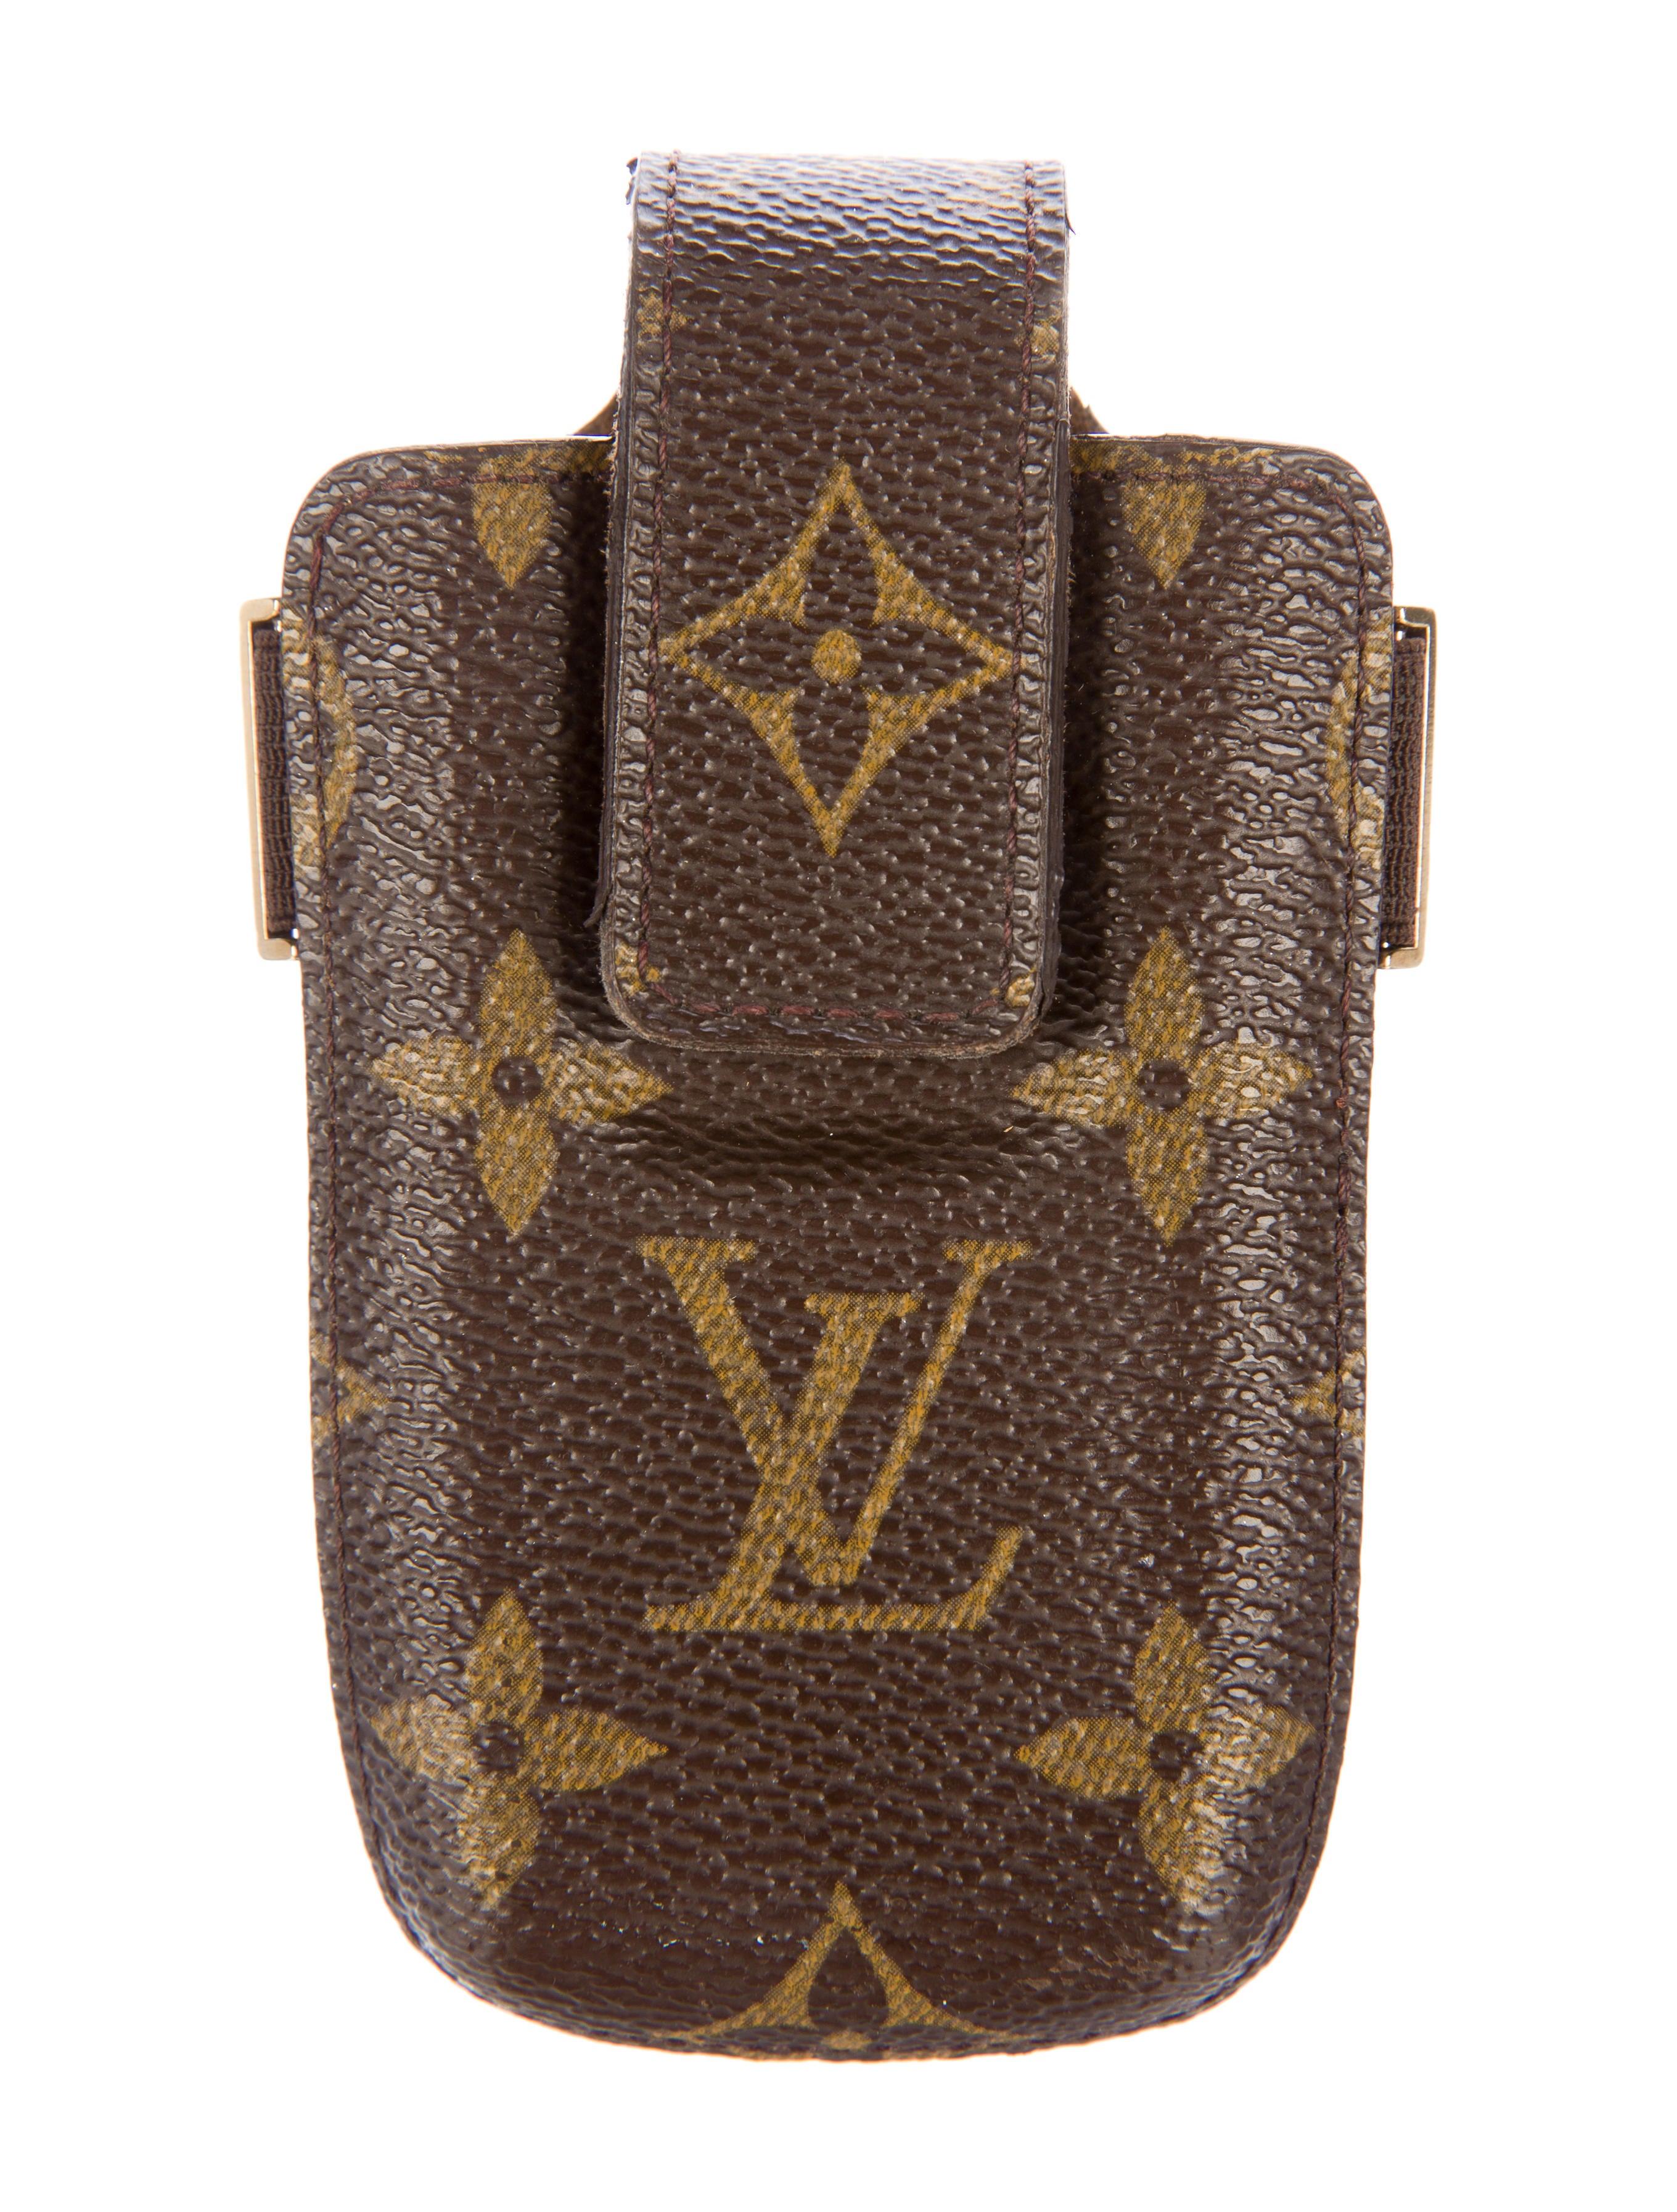 Louis Vuitton Monogram Phone Case - Accessories - LOU95284  The RealReal